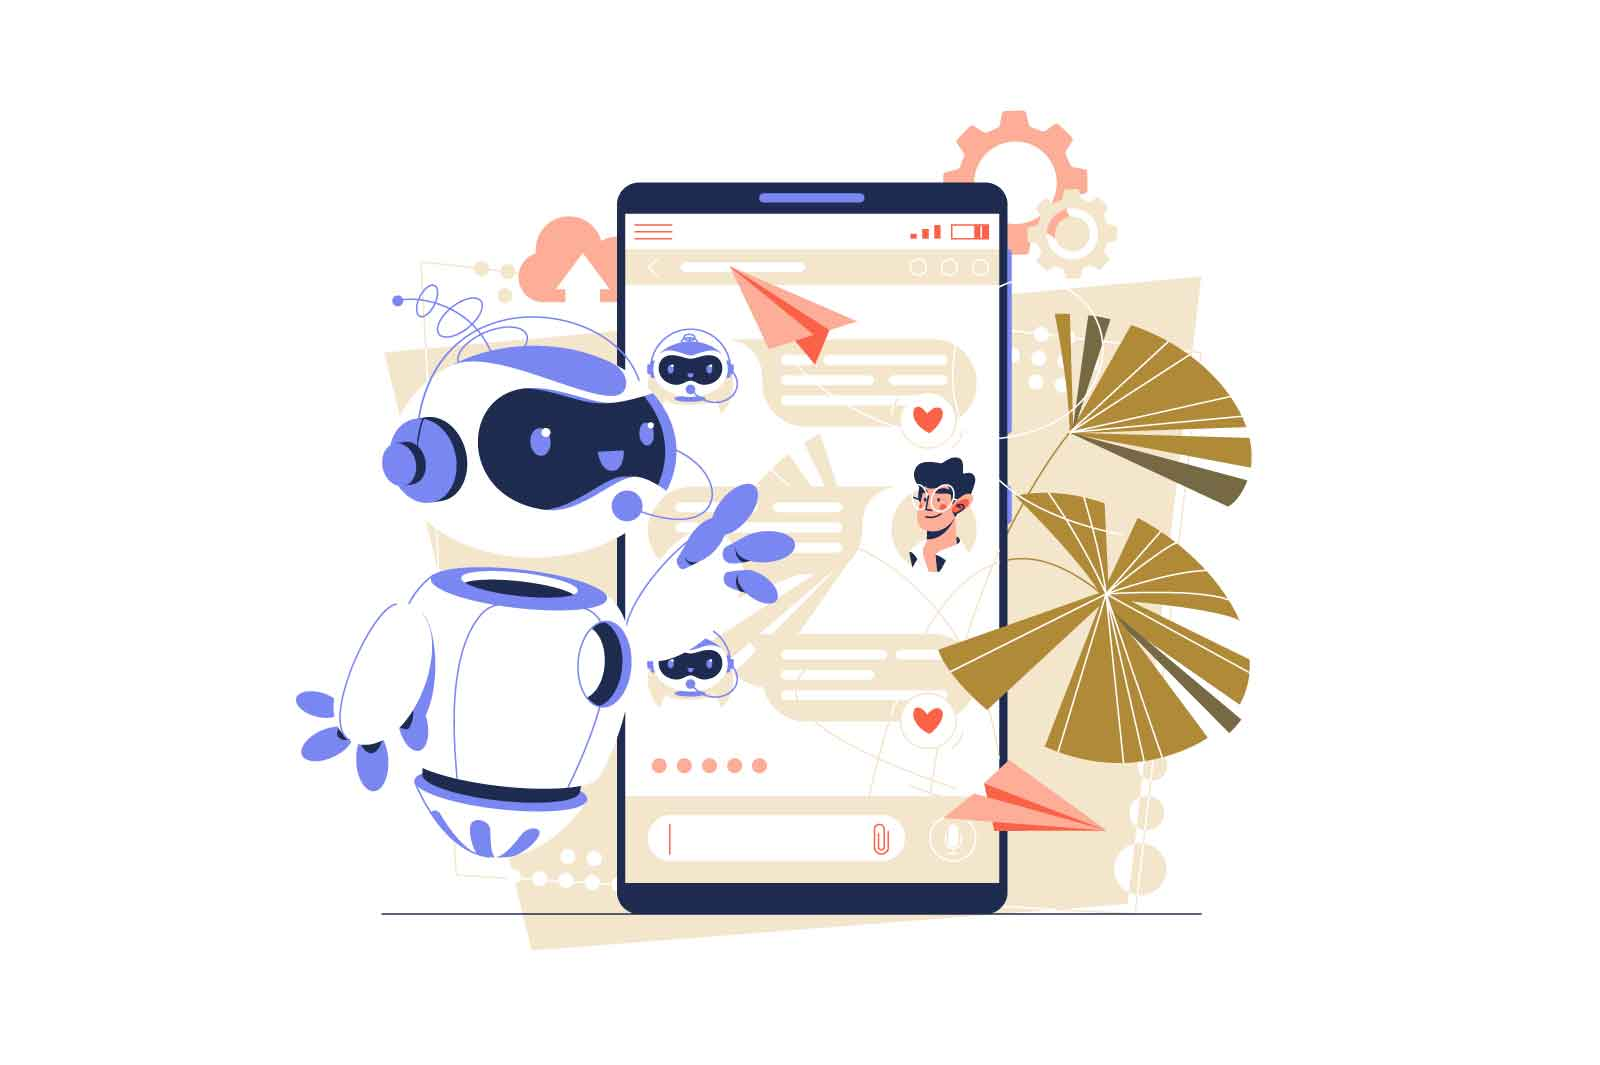 Chatbot helper customer service support vector illustration. People talk with chatbot robot in smartphone app flat style. Platform concept